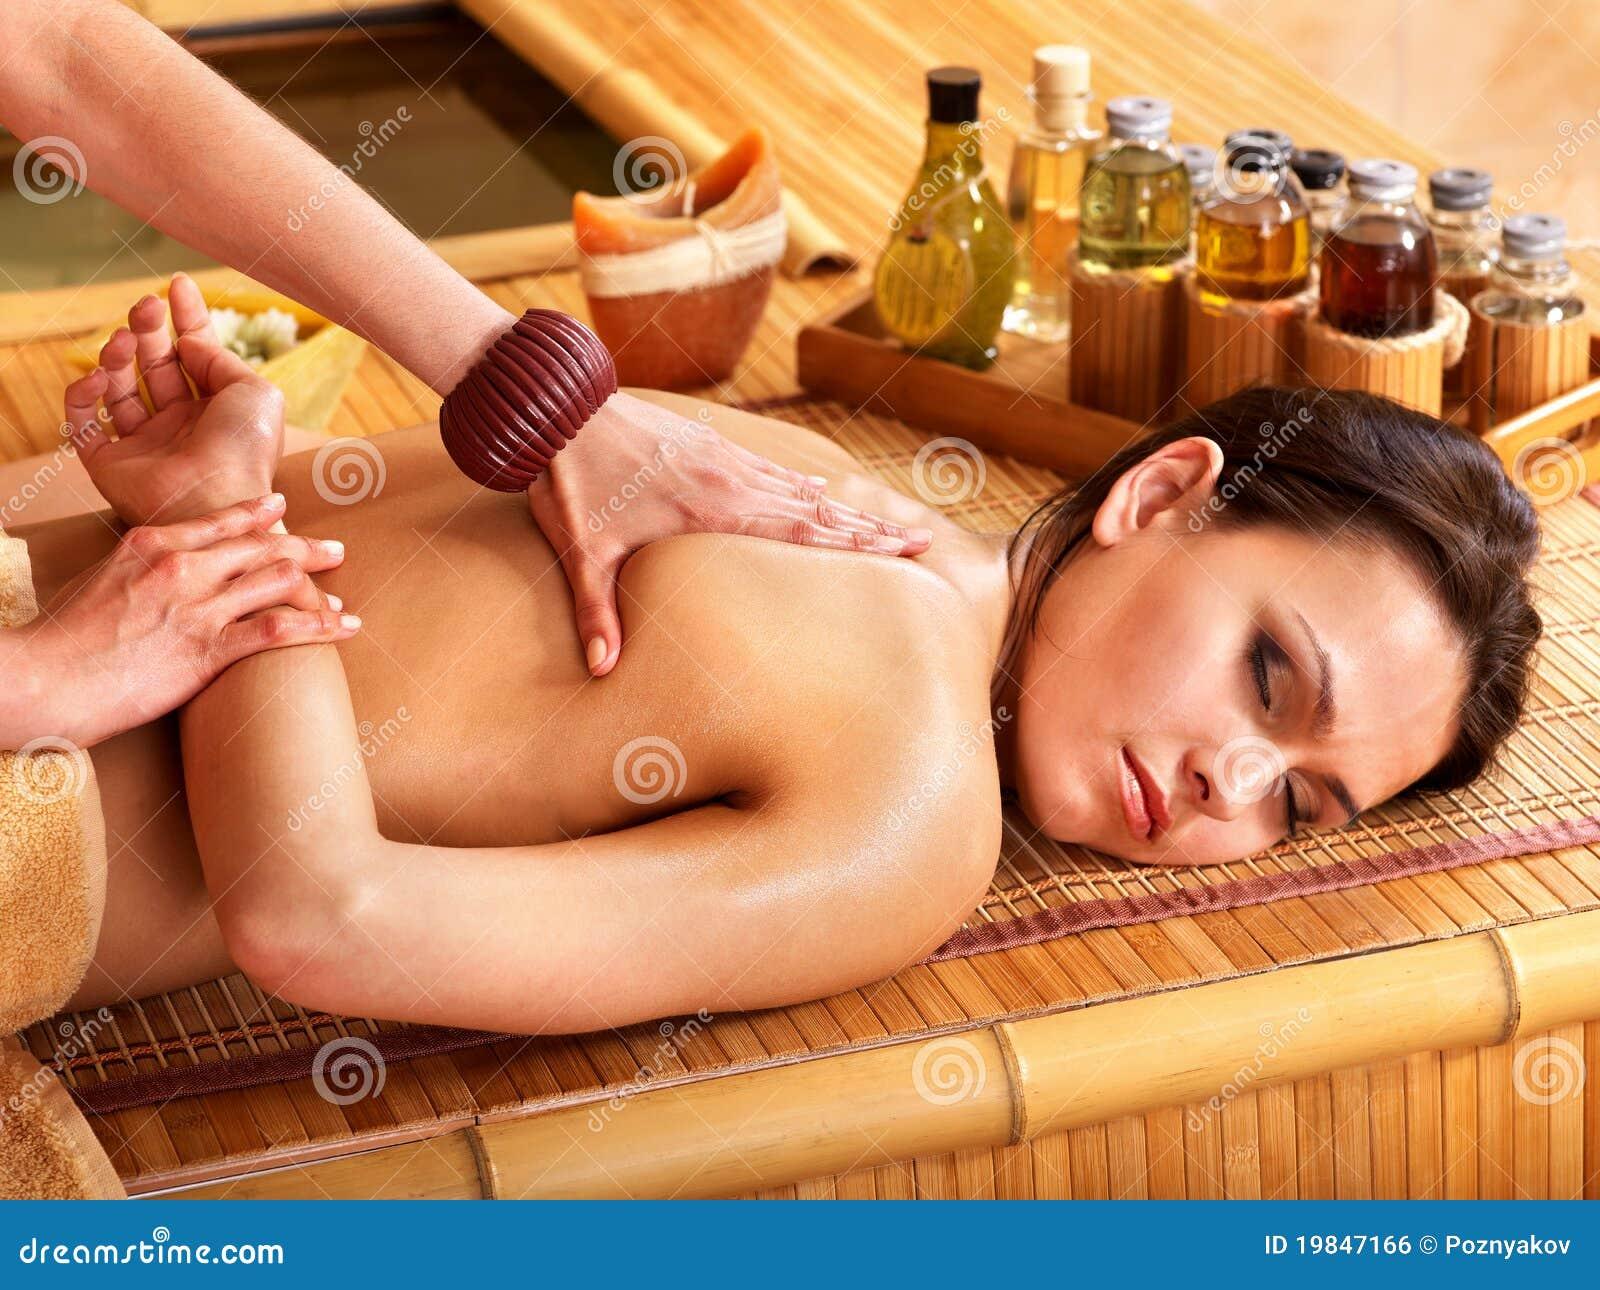 bamboo thai massage gratis sexdate